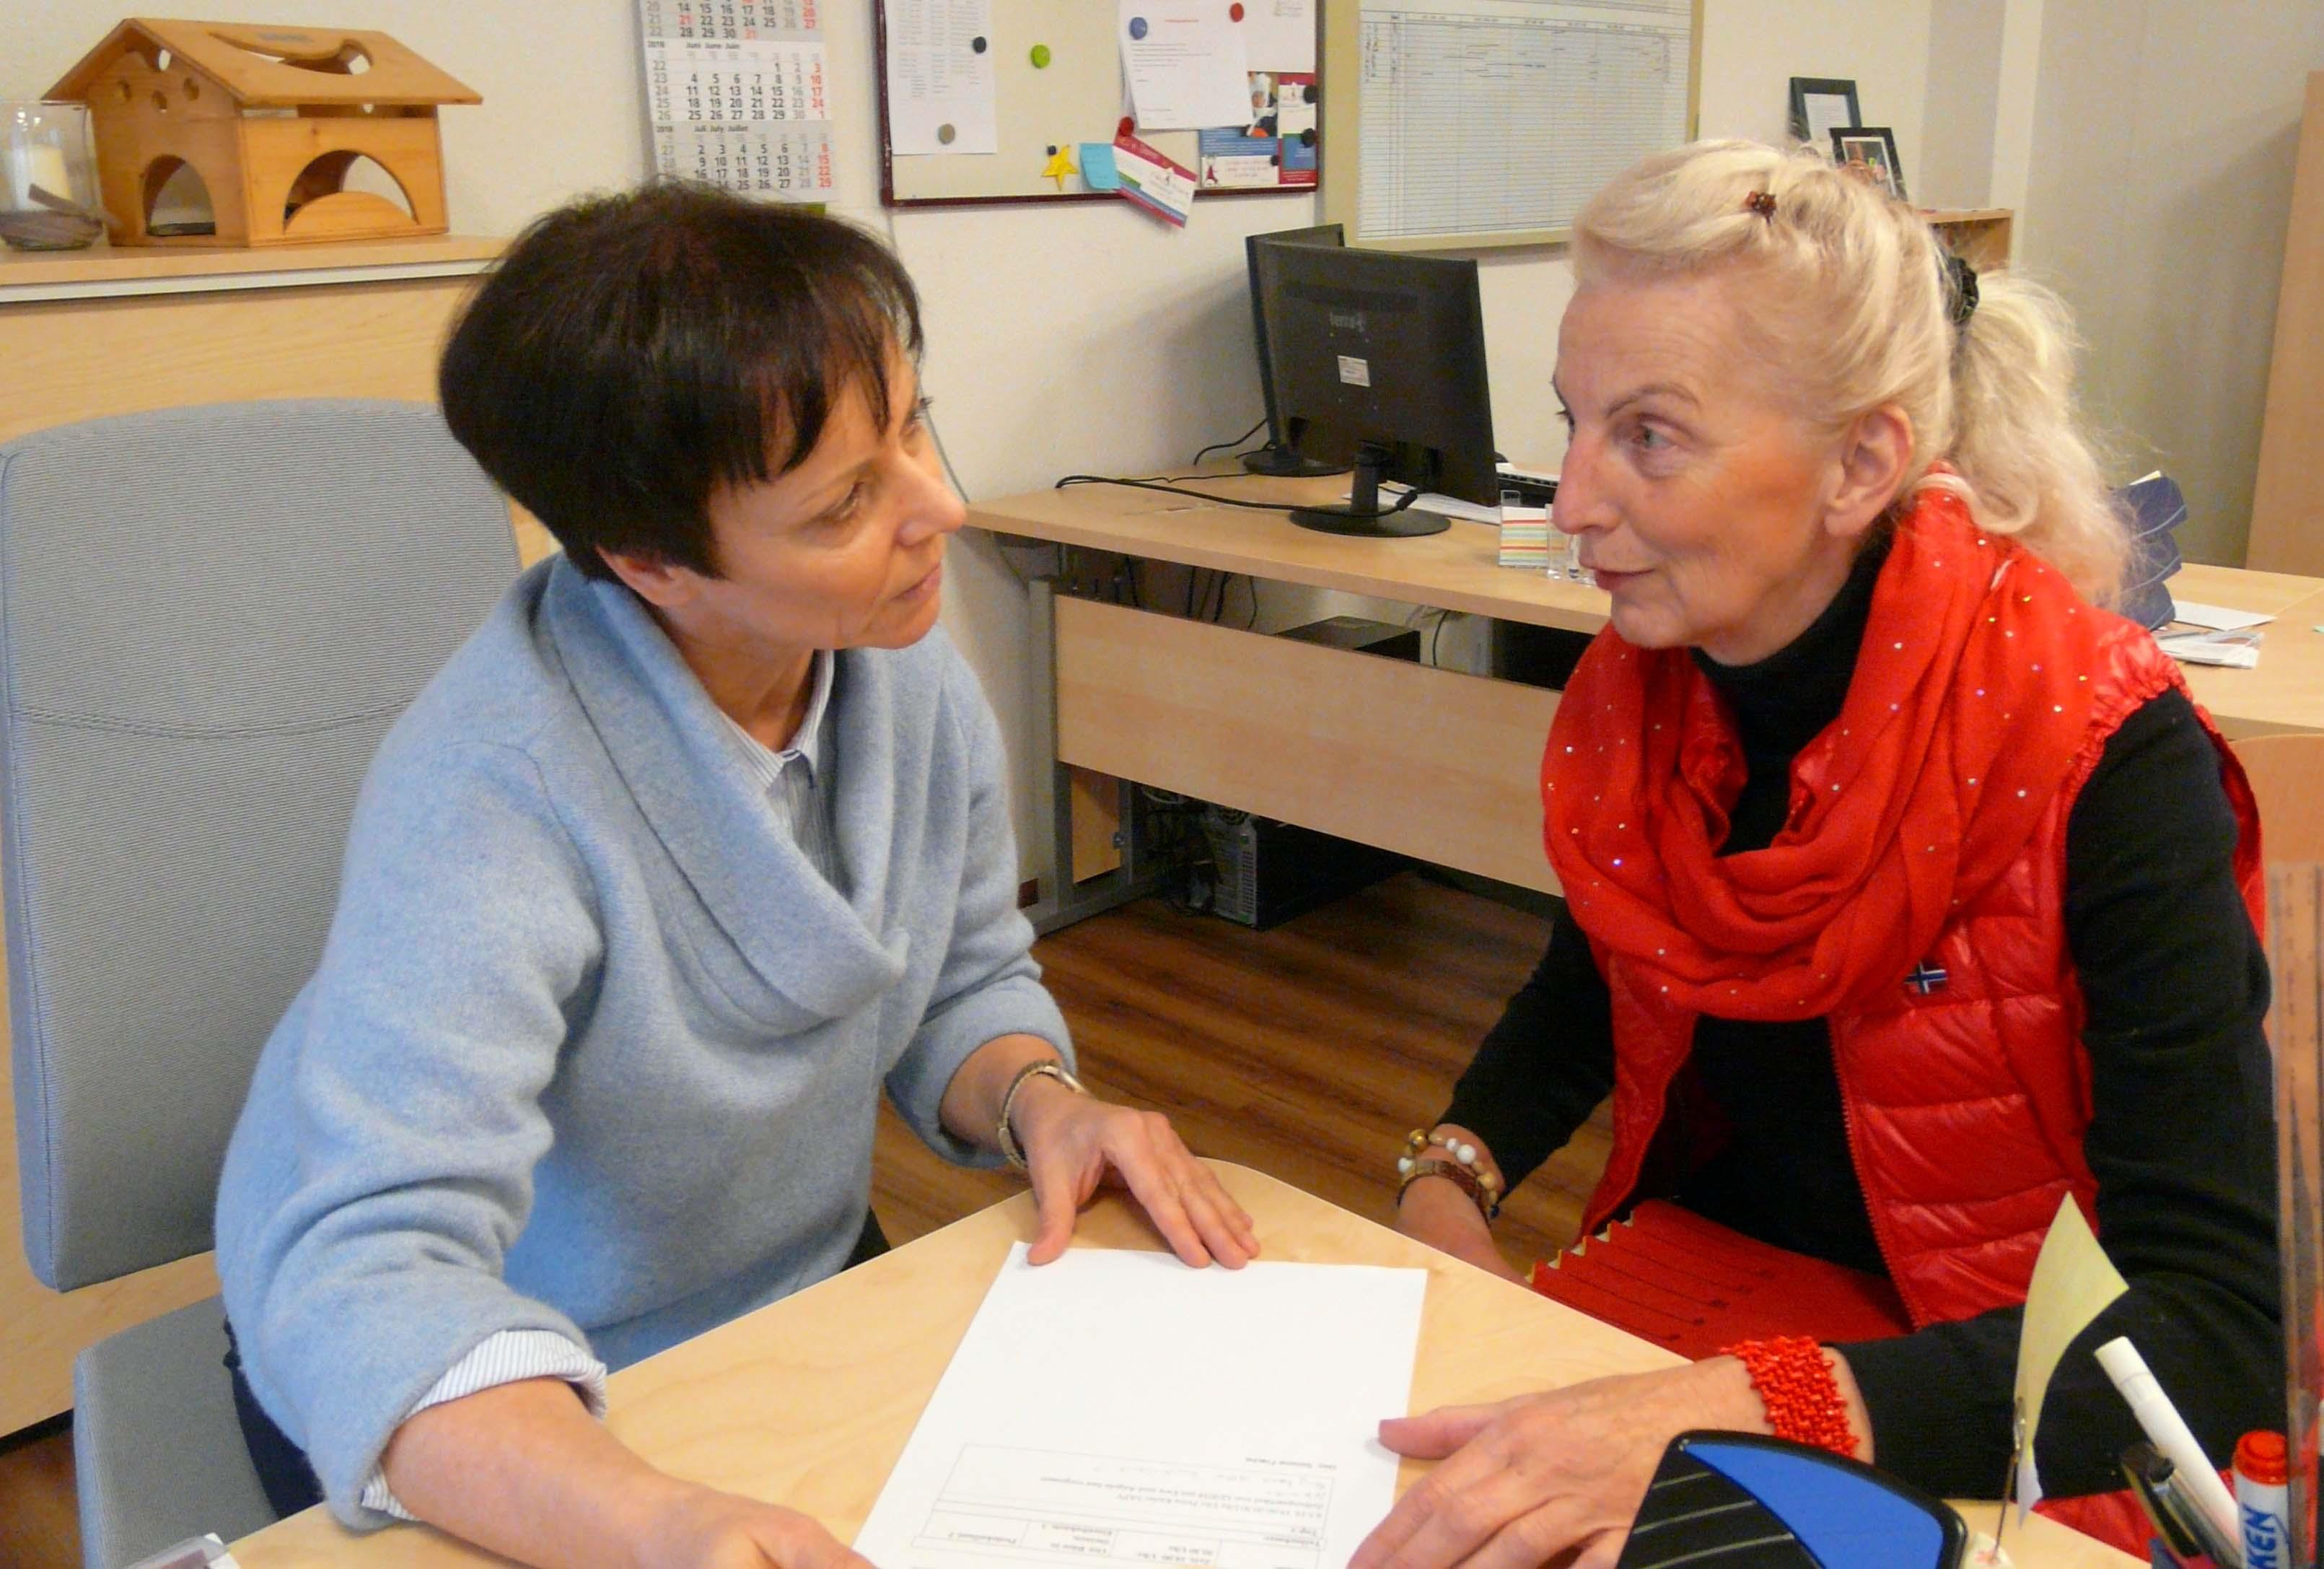 Simone Frache und Claudia Trimpin engagieren sich im Hospizdienst.